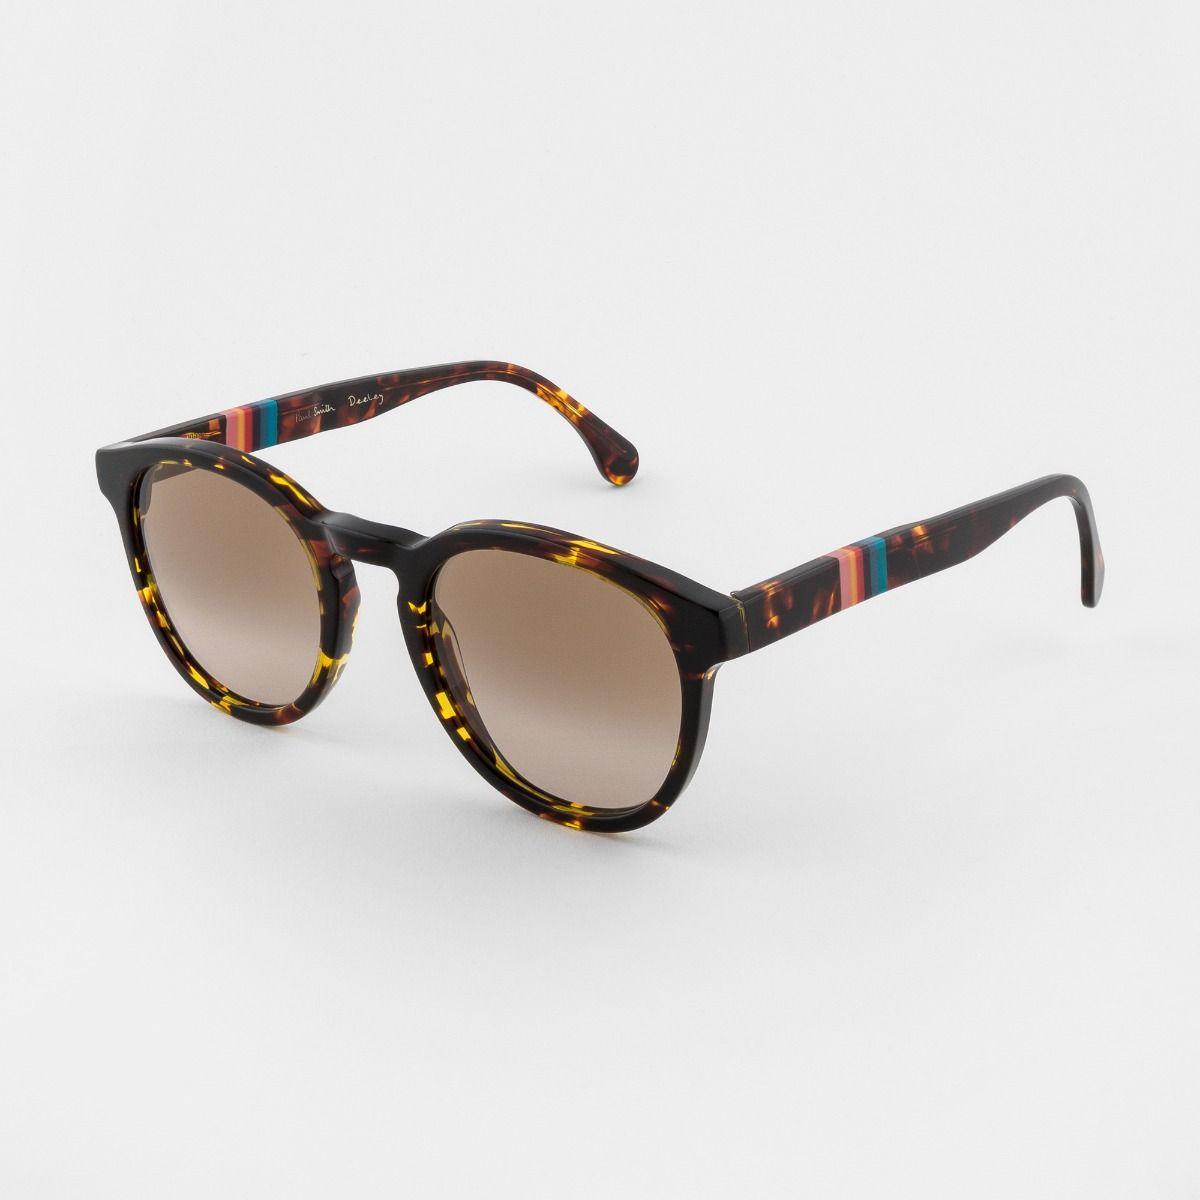 Paul Smith Deeley Round Sunglasses